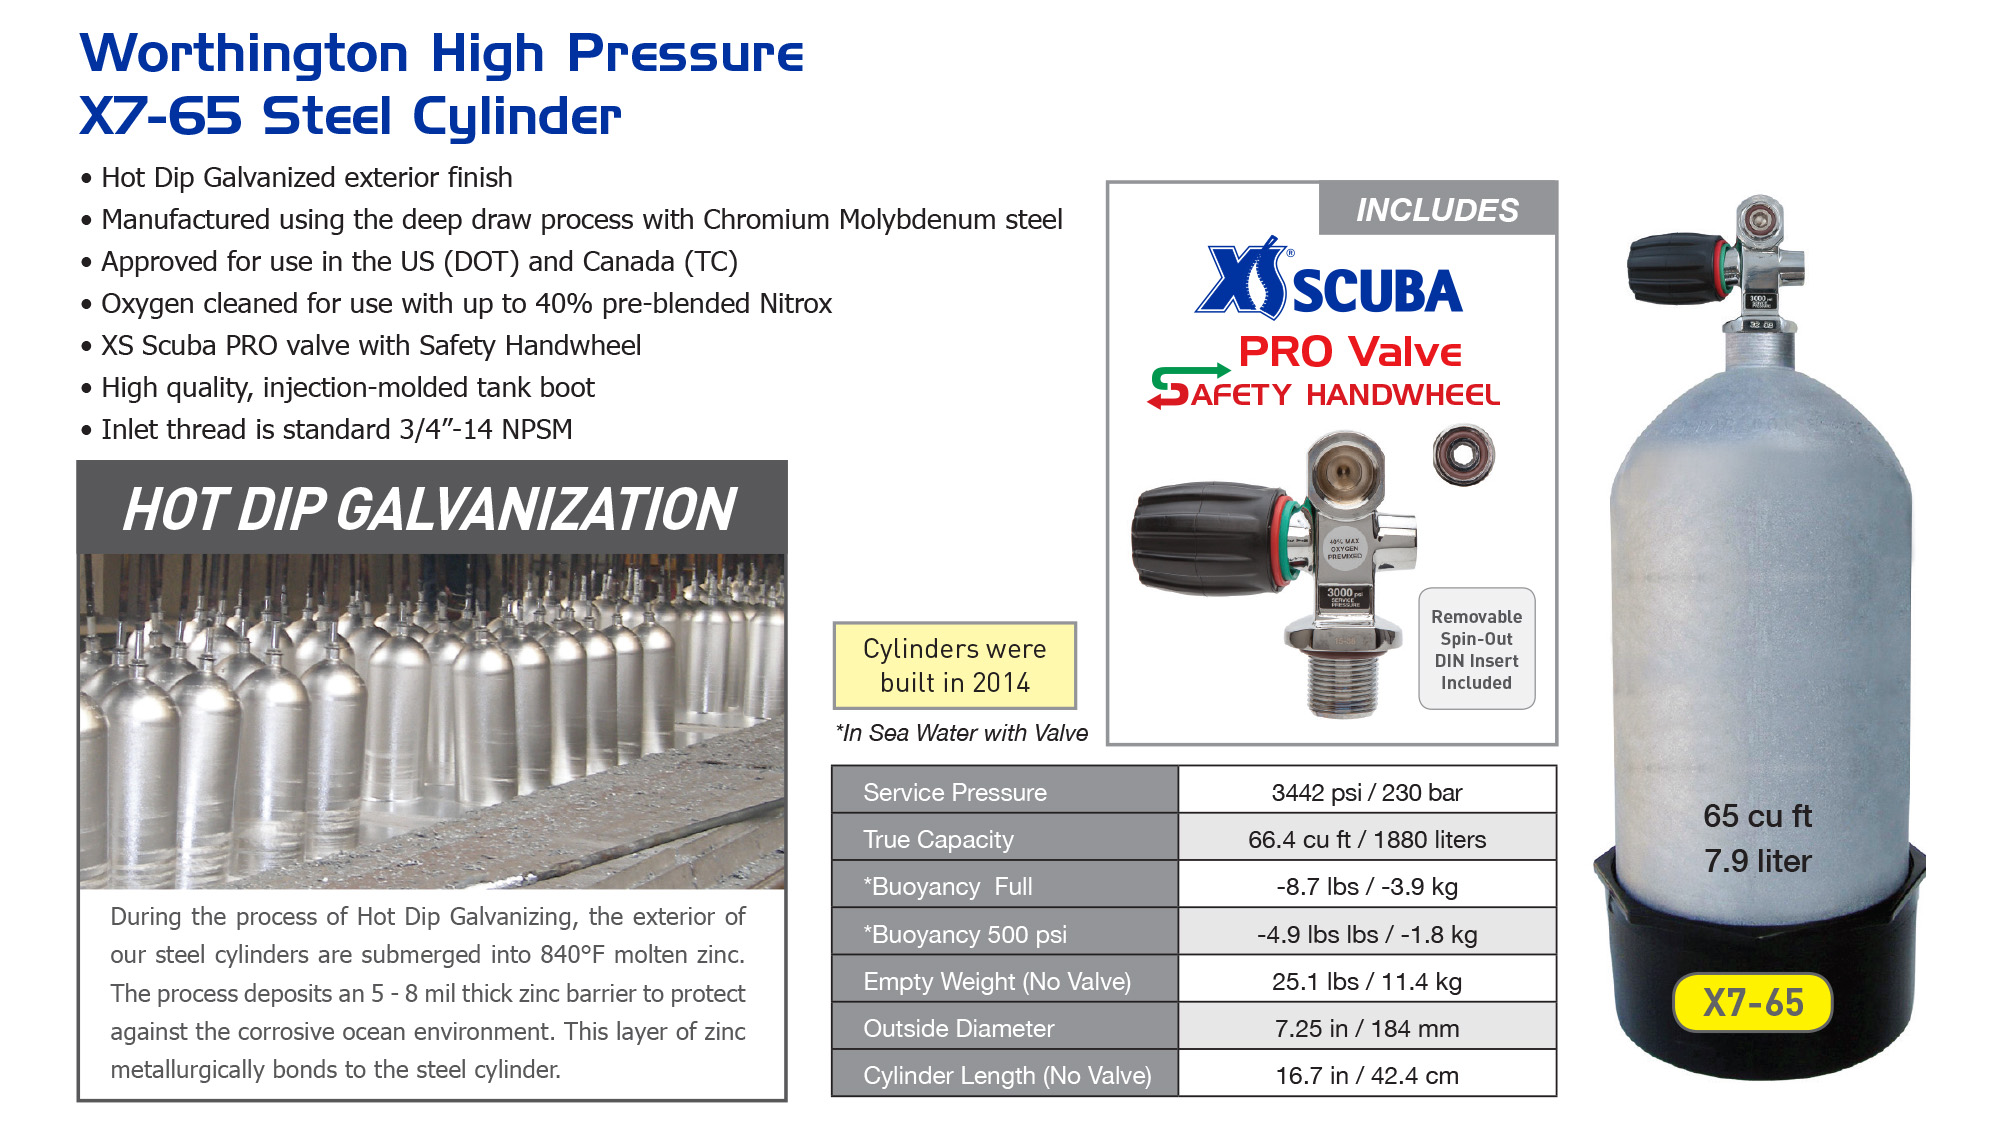 Worthington High Pressure X7 Steel Cylinder — XS Scuba